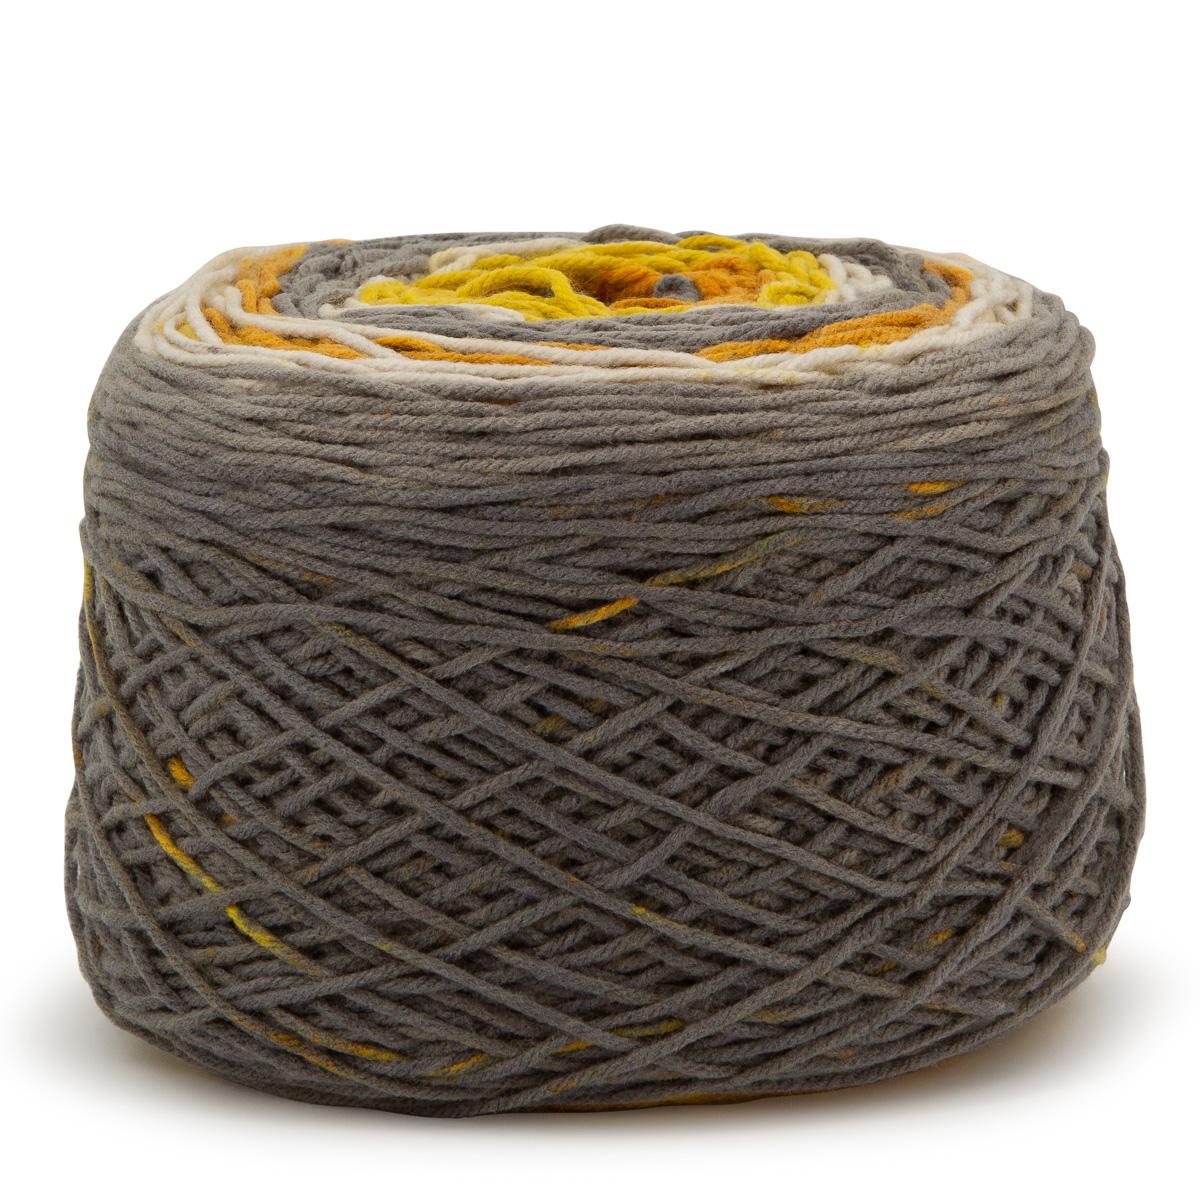 Caron-Big-Cakes-100-Acrylic-Worsted-Striping-Yarn-Medium-4-Cake-Knit-Crochet thumbnail 13